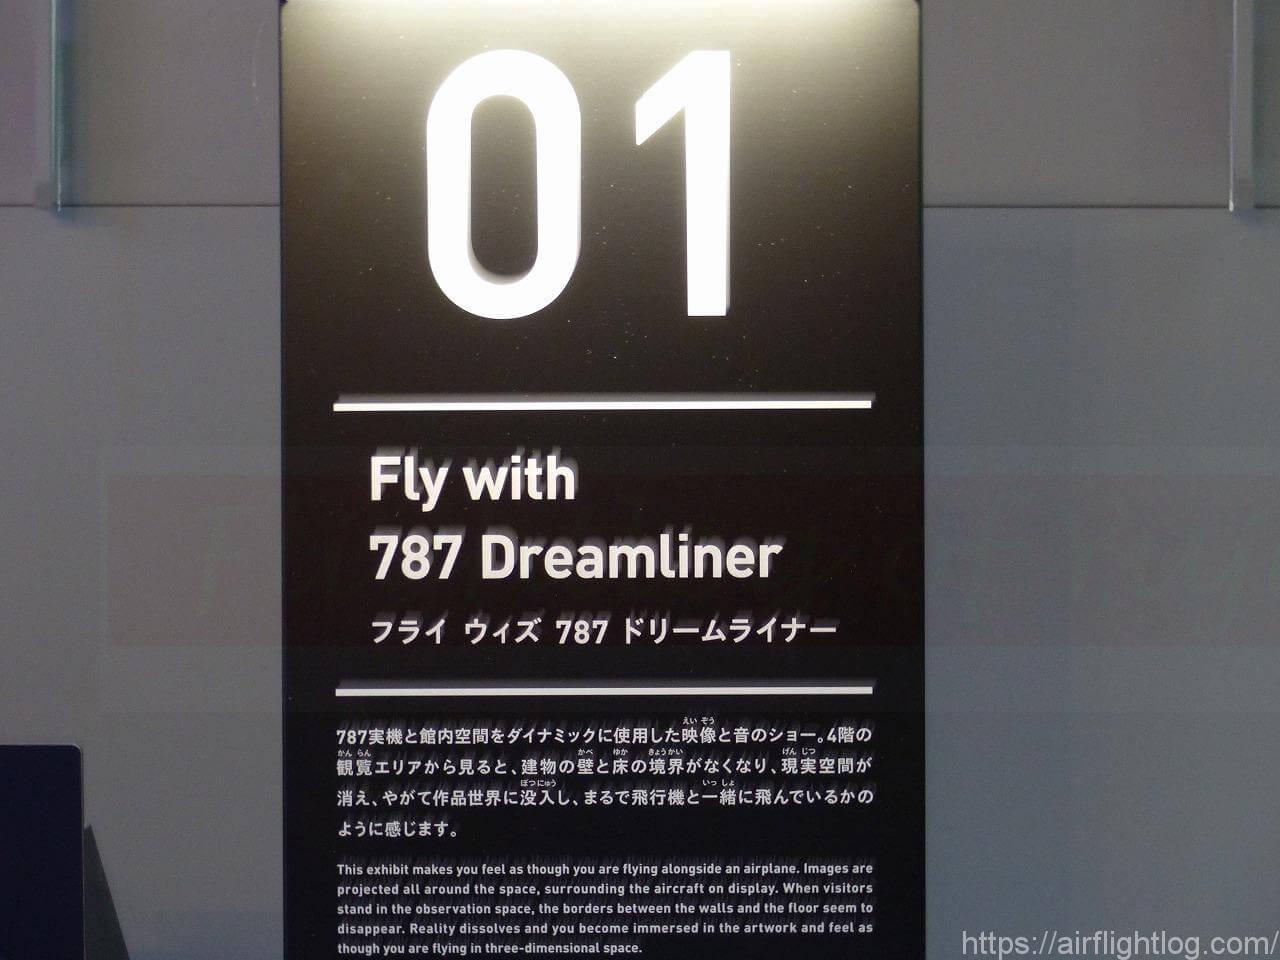 「FLIGHT OF DREAMS(フライト・オブ・ドリームズ)」案内板